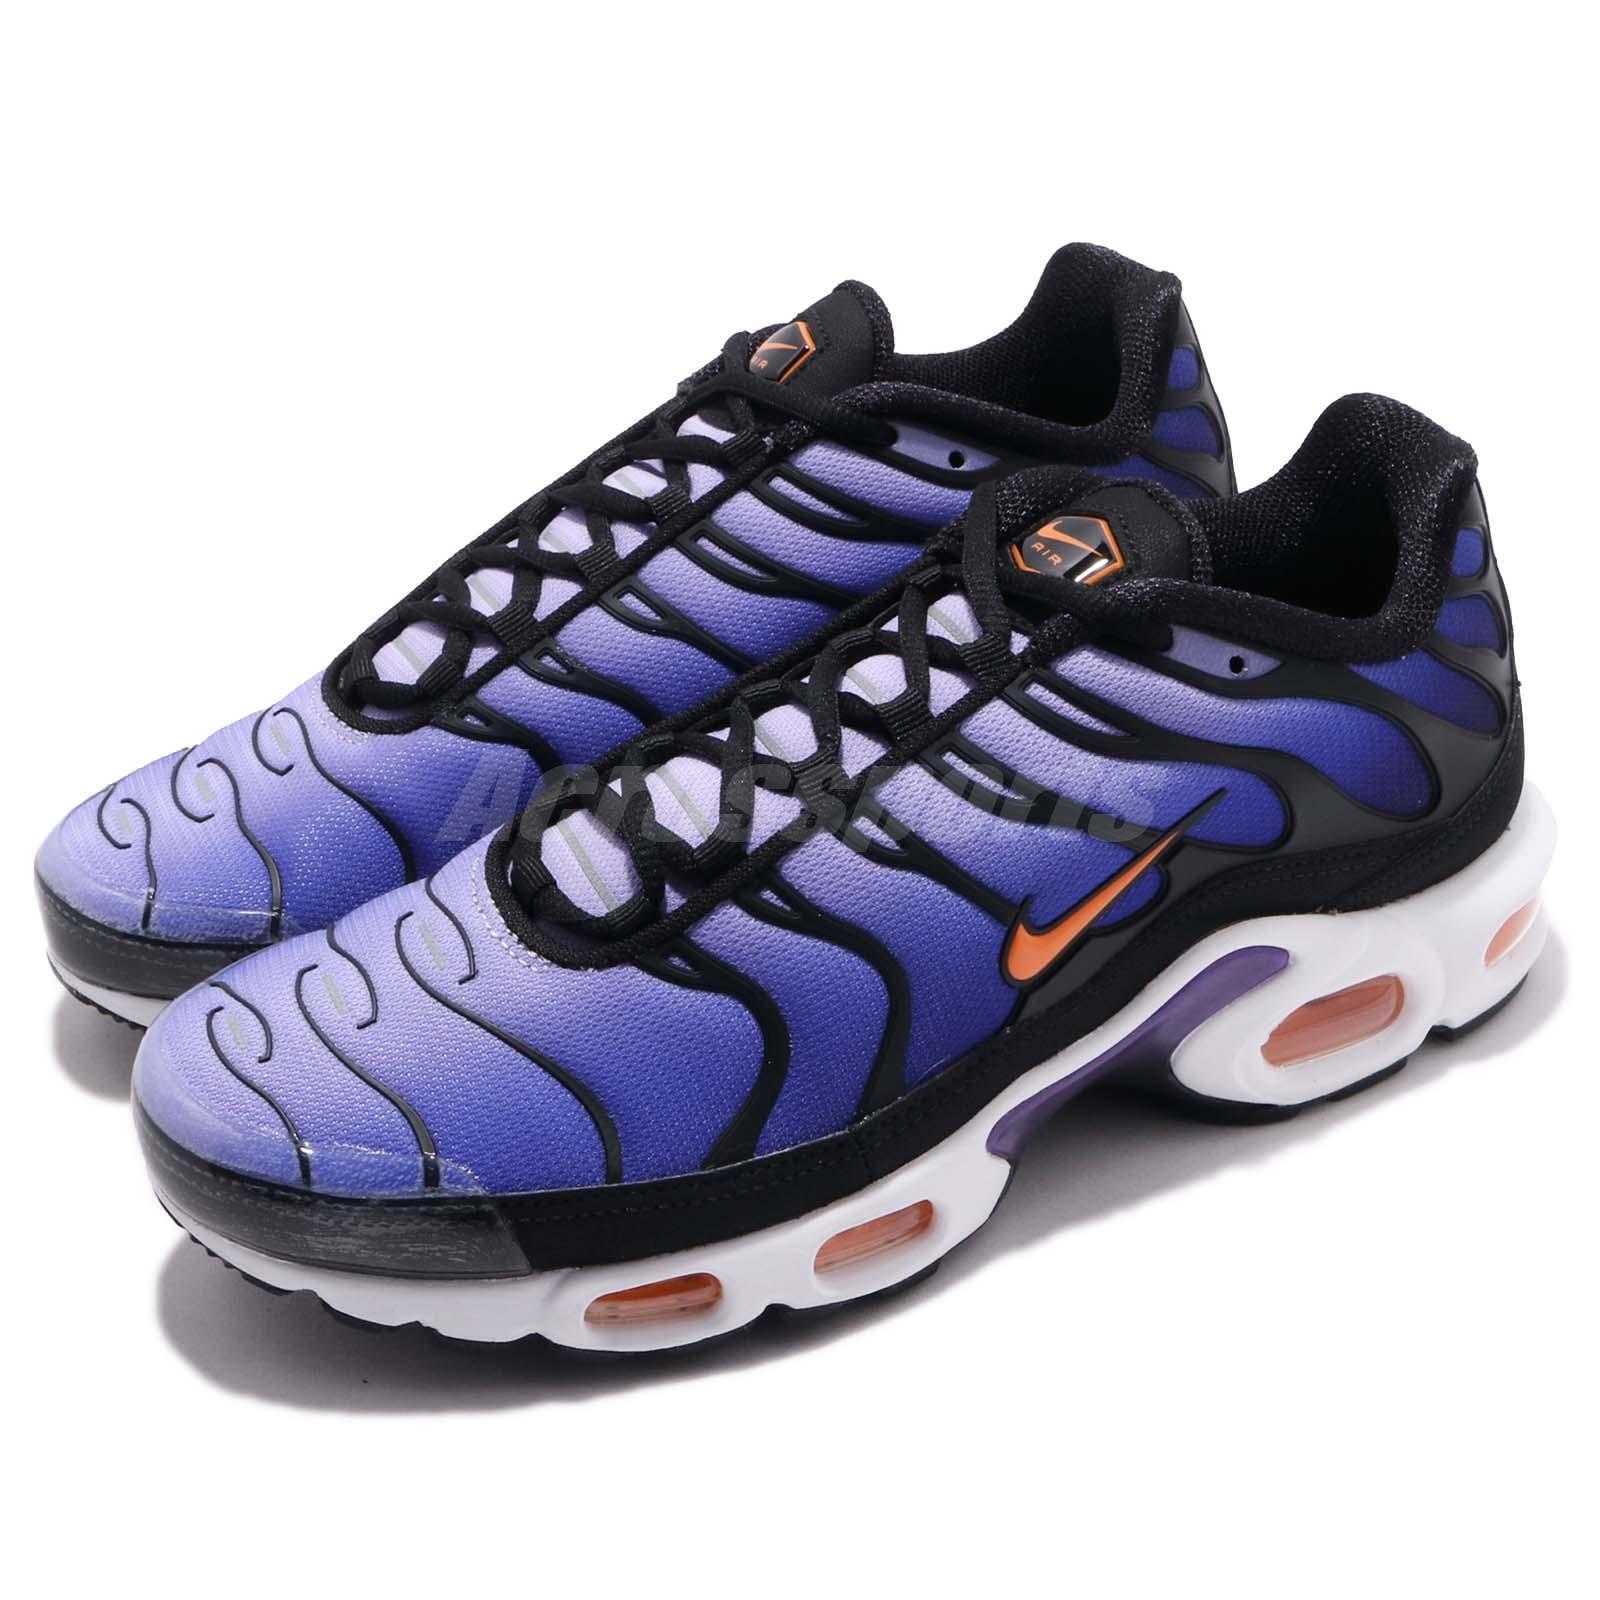 08685a2087 Nike Air Max Plus OG Voltage Purple Black orange Mens Running shoes  BQ4629-002